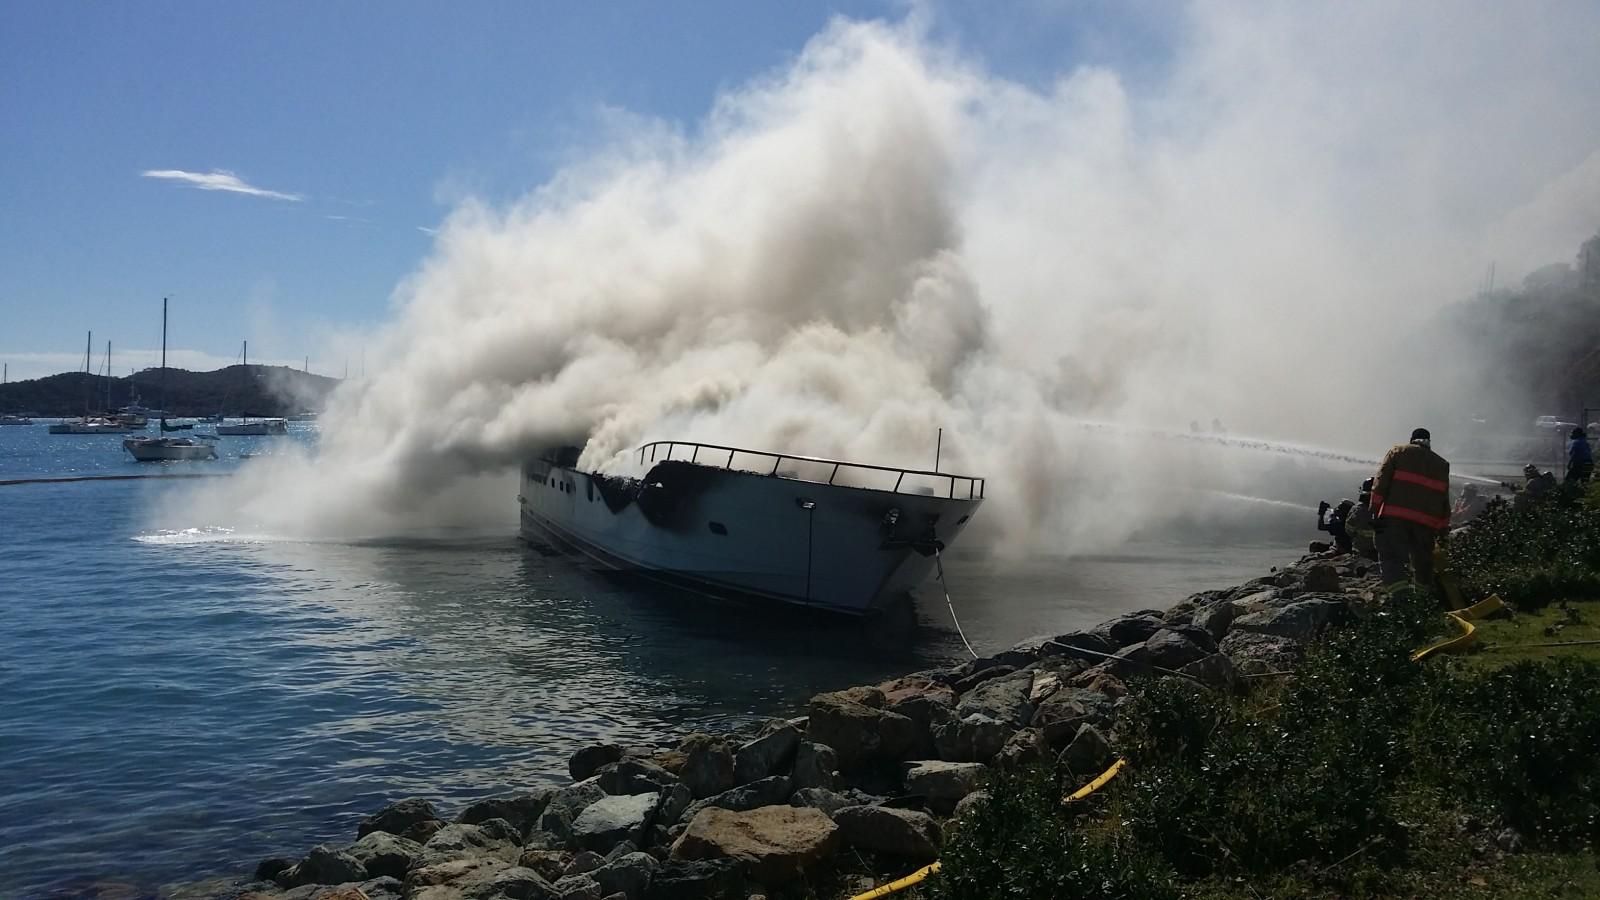 Yacht Haven Grande fire Dean Barnes photo credit (5)